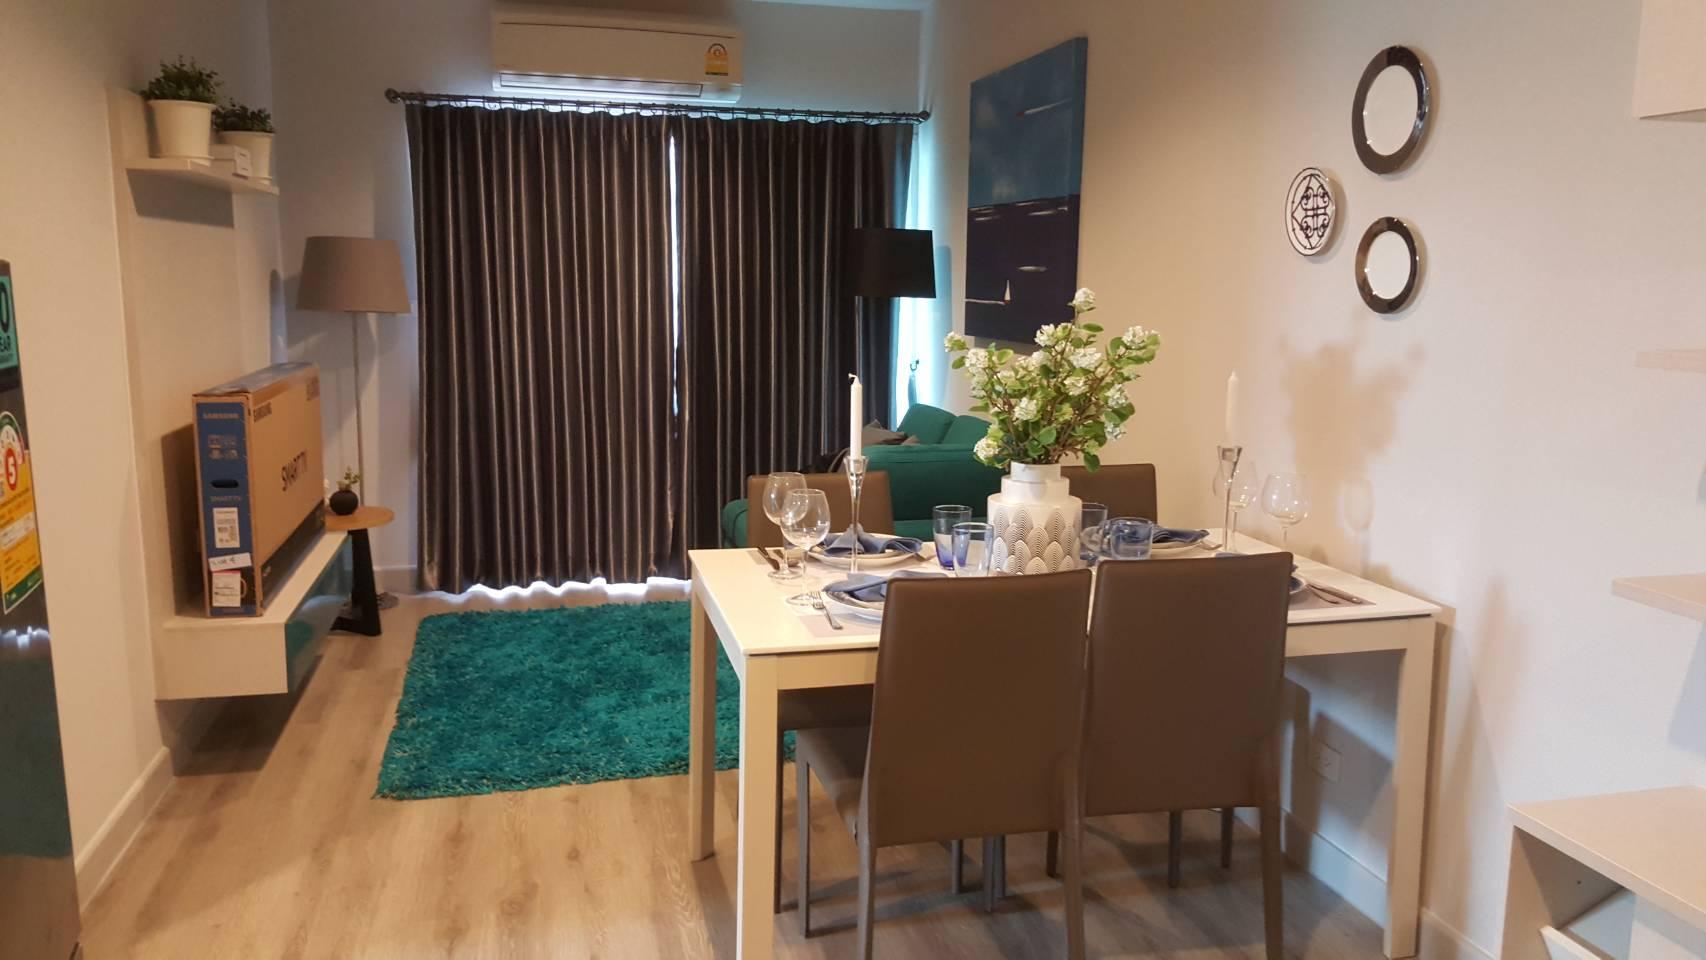 Centric Sea Pattaya (เซ็นทริค ซี พัทยา) 2 ห้องนอน ให้เช่า หรือขาย